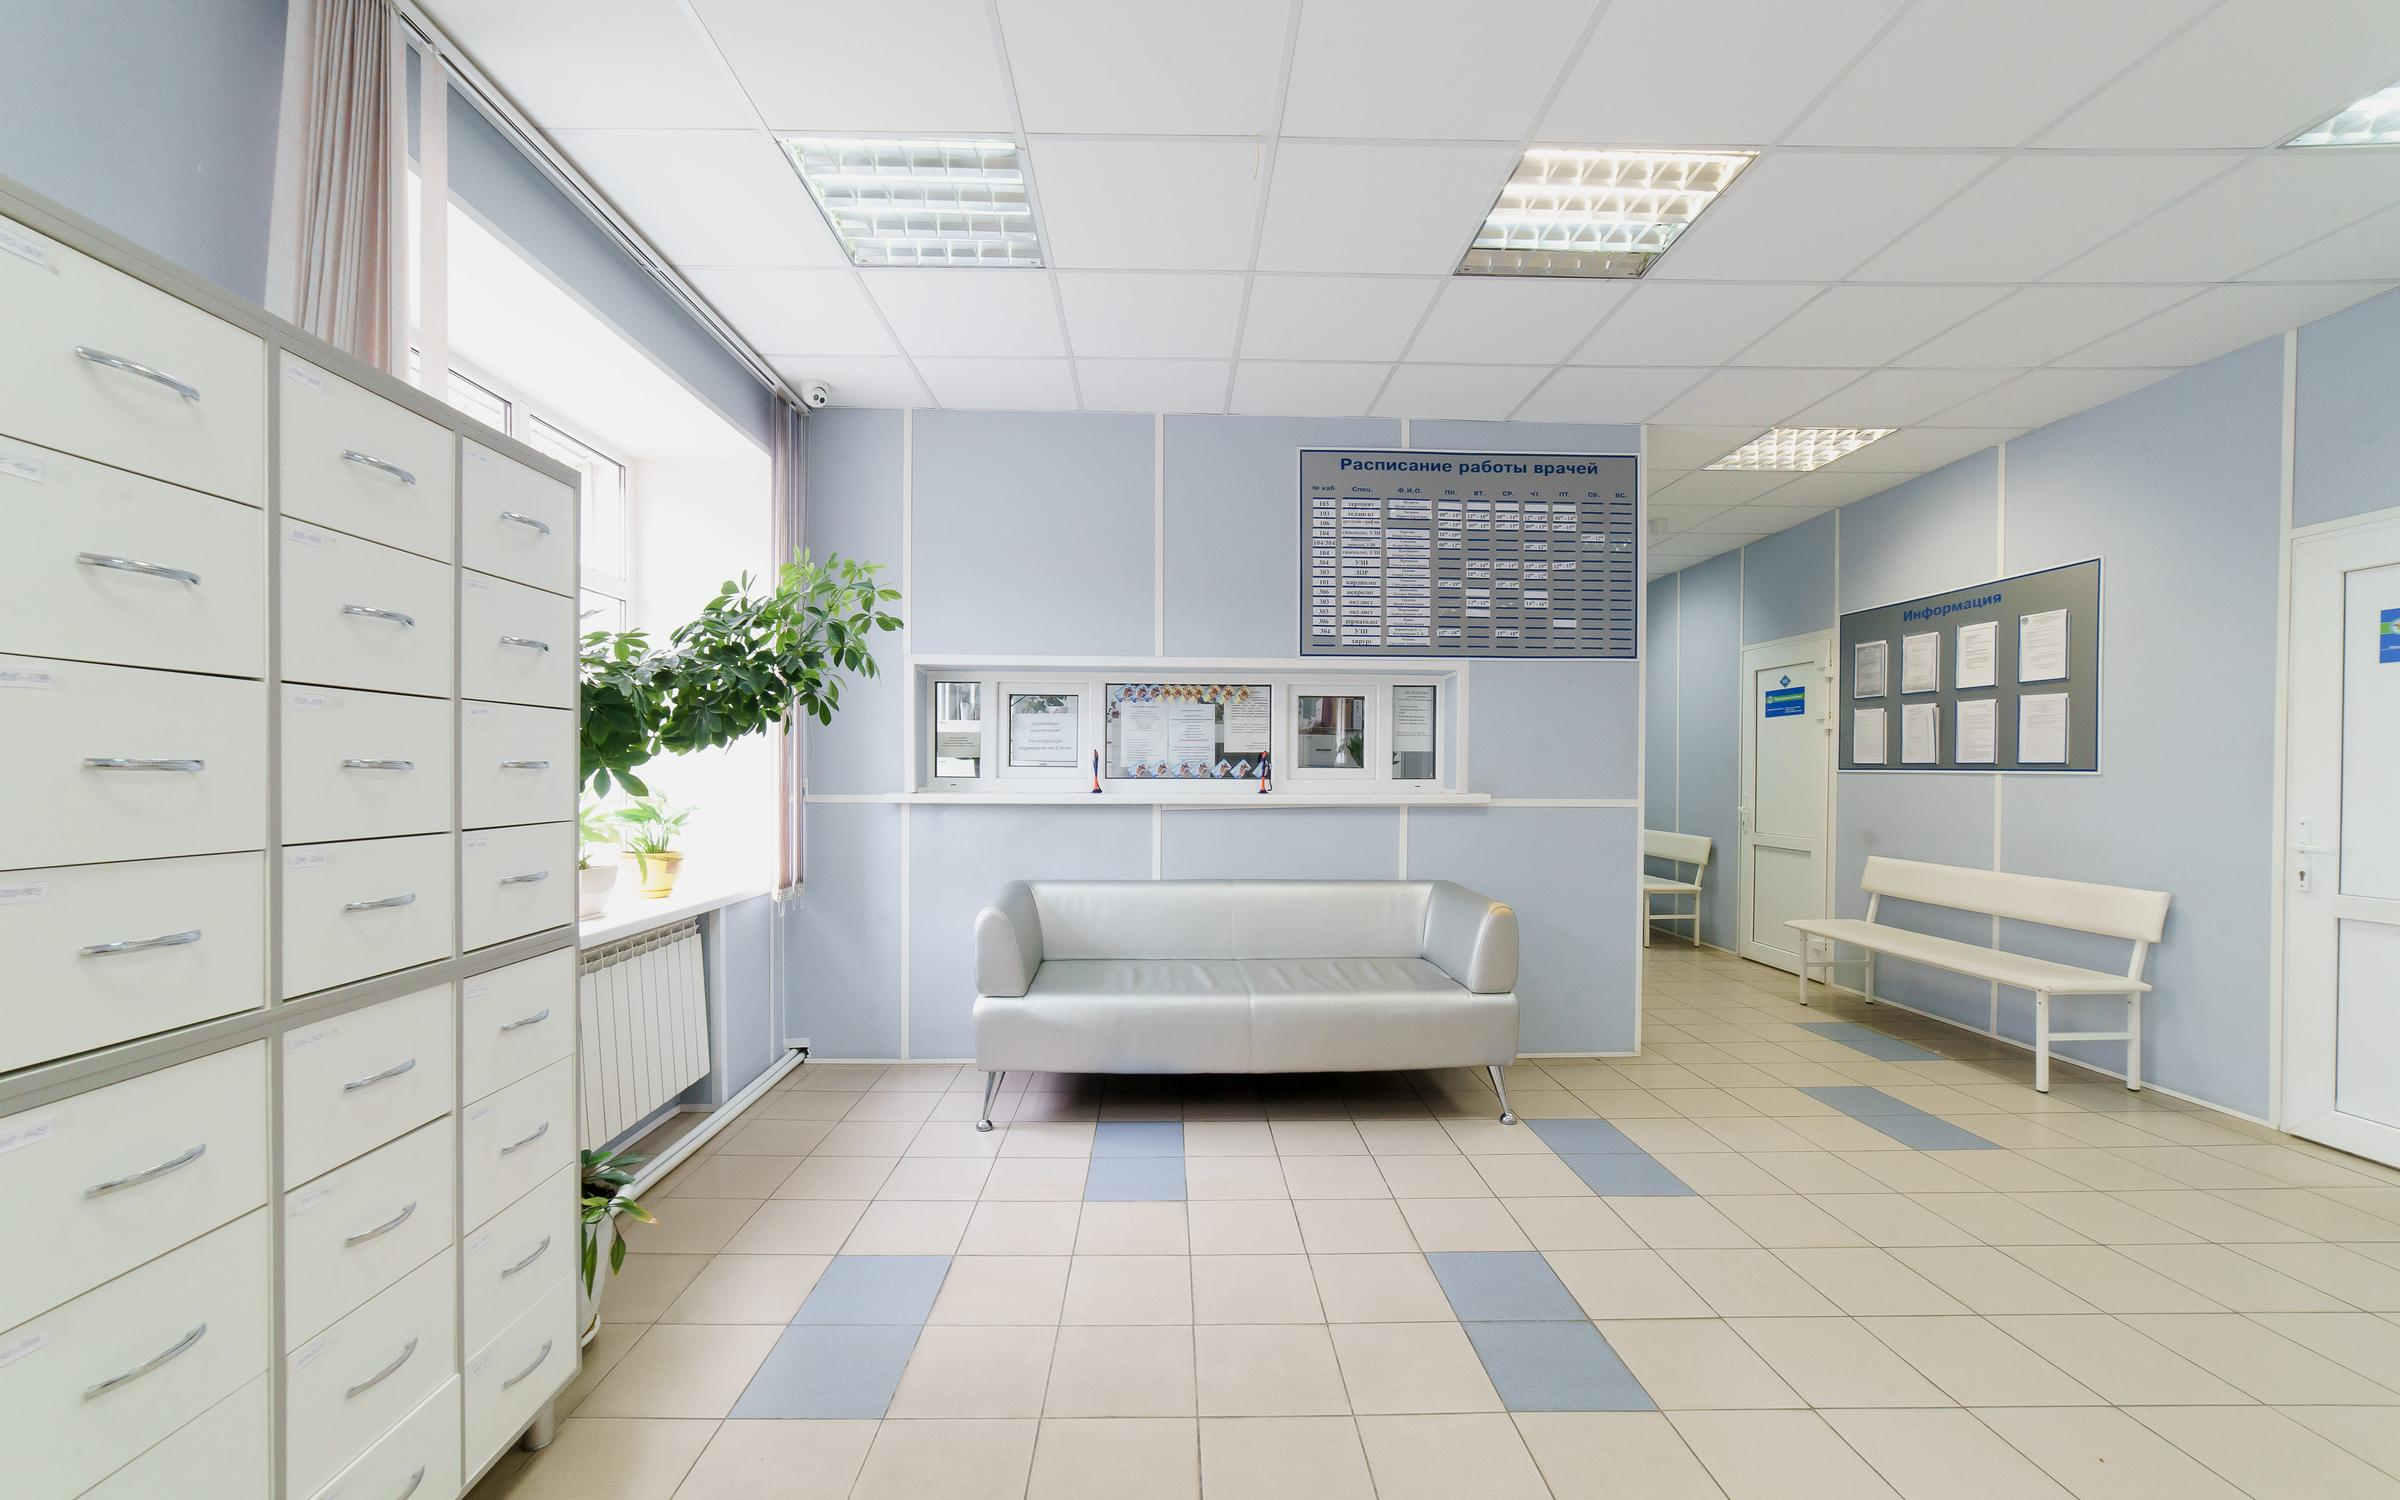 Медицинский центр теплообменник нижний новгород Кожухотрубный испаритель WTK SCE 293 Сергиев Посад